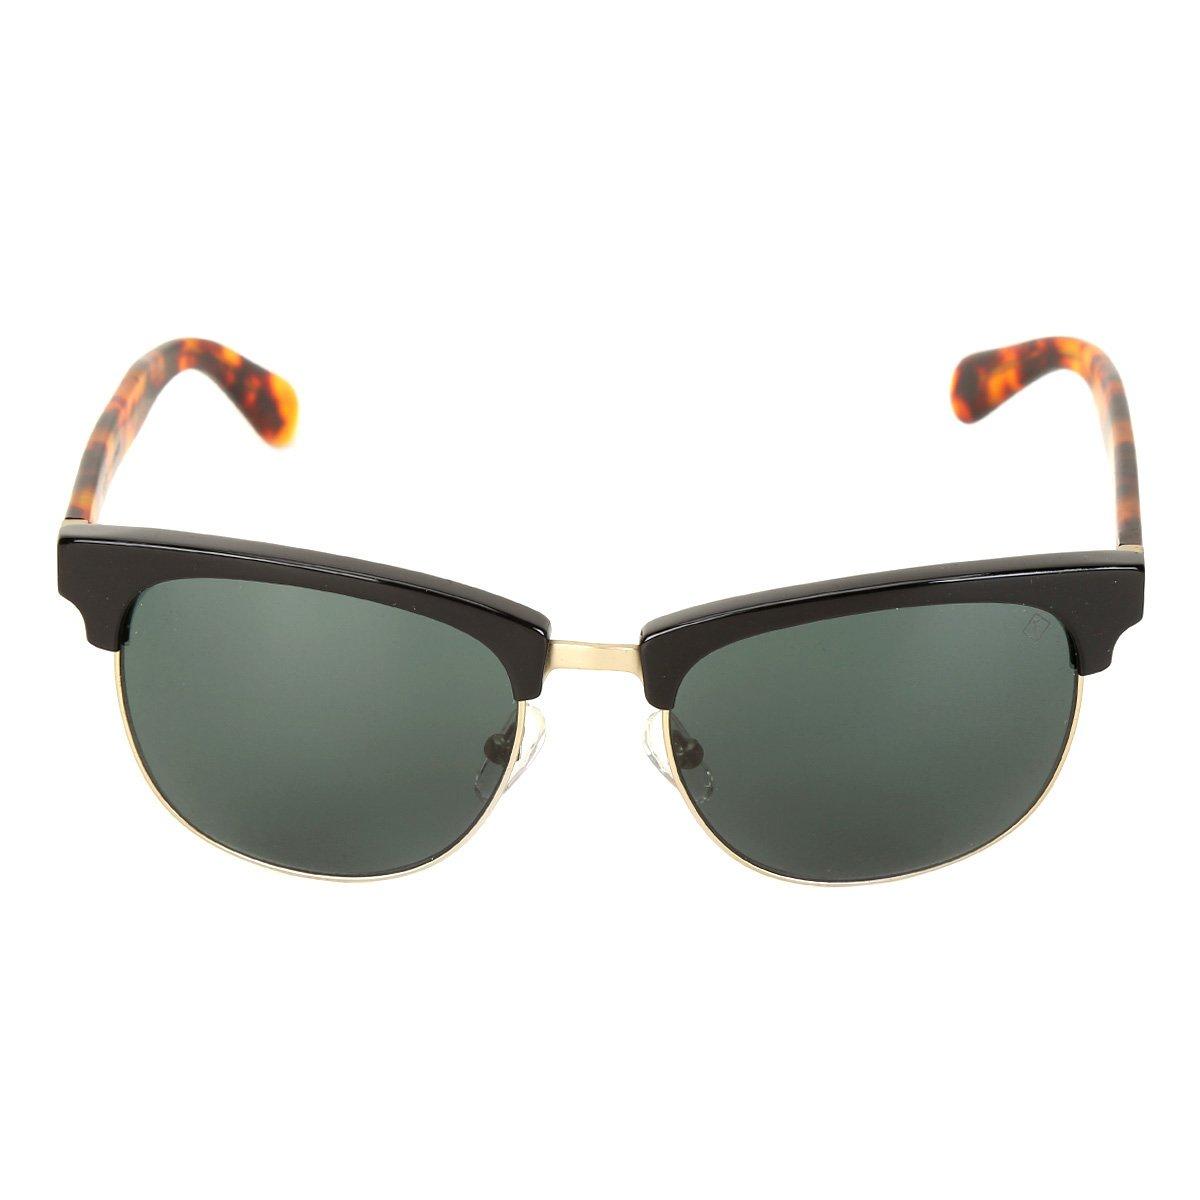 Óculos de Sol Forum Tartaruga Feminino - Compre Agora   Netshoes bf10e4086a